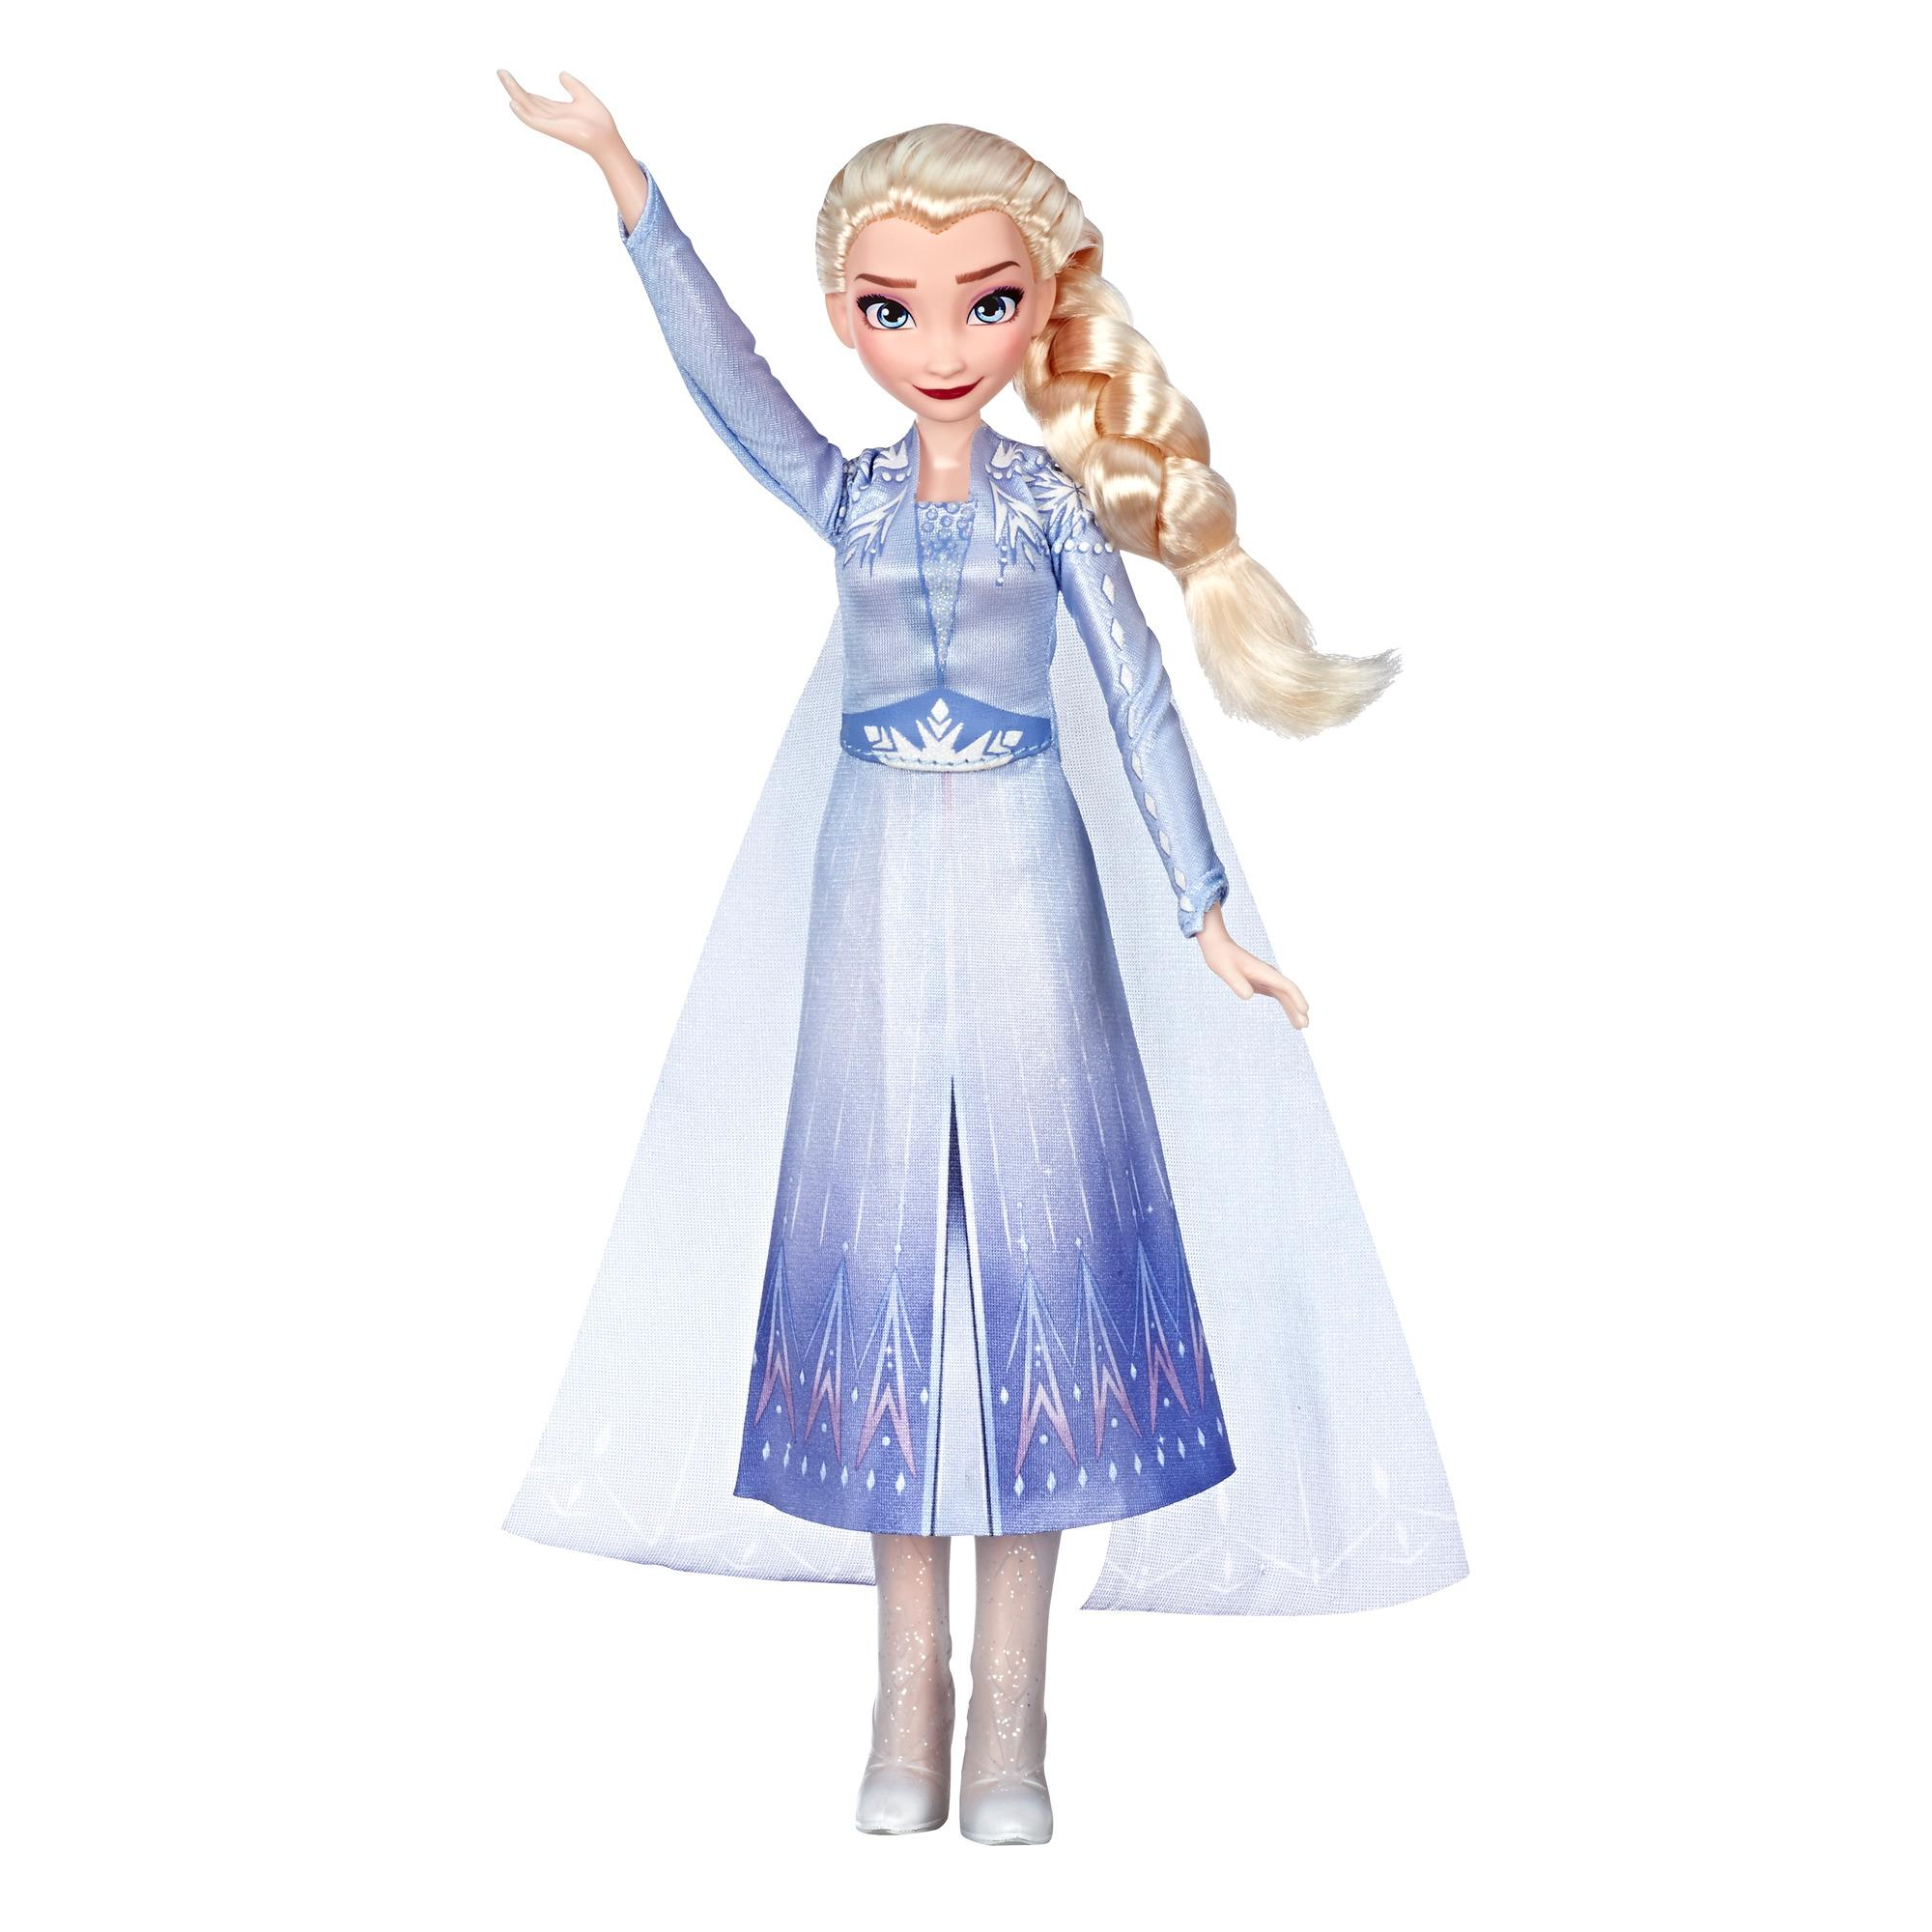 Frozen 2, Η Έλσα που τραγουδά